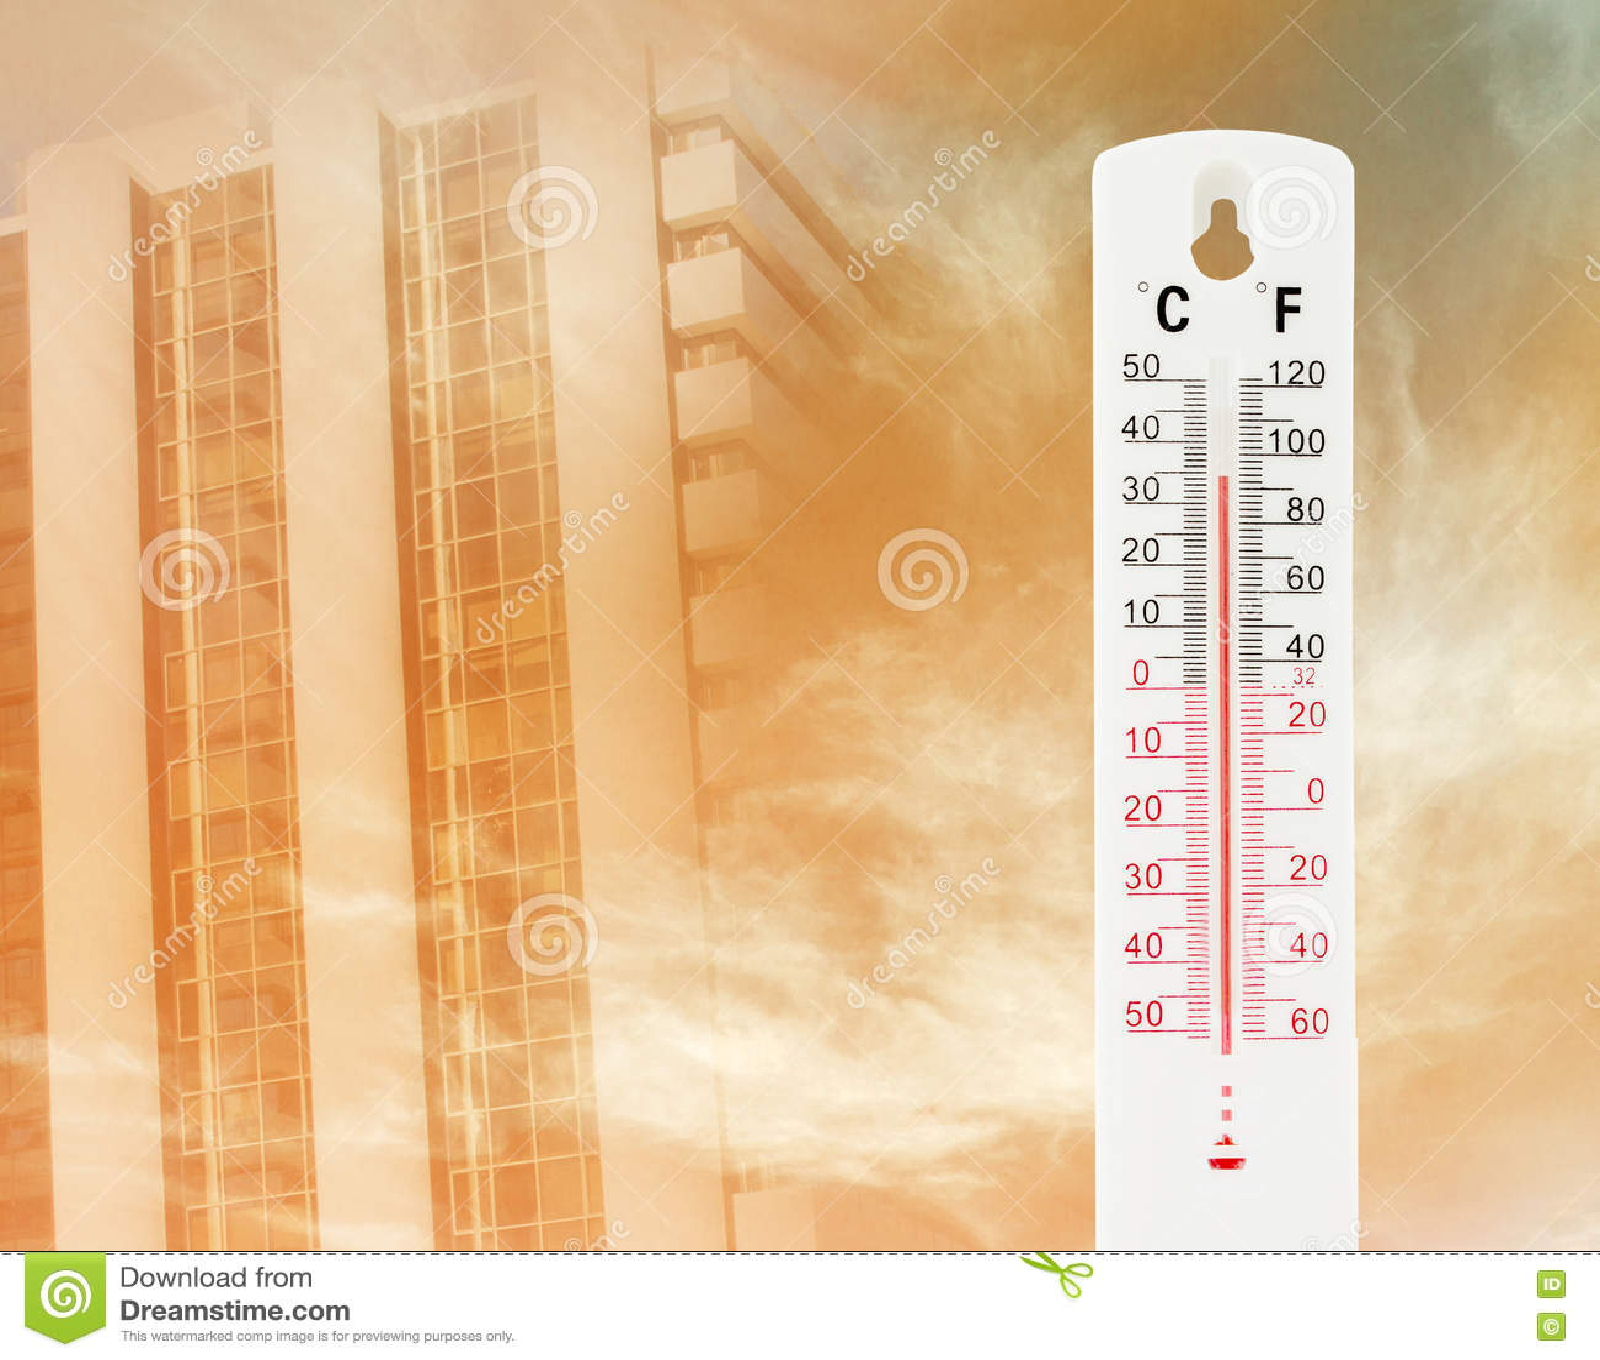 Tropical Temperature Of 34 Degrees Celsius Measured Stock